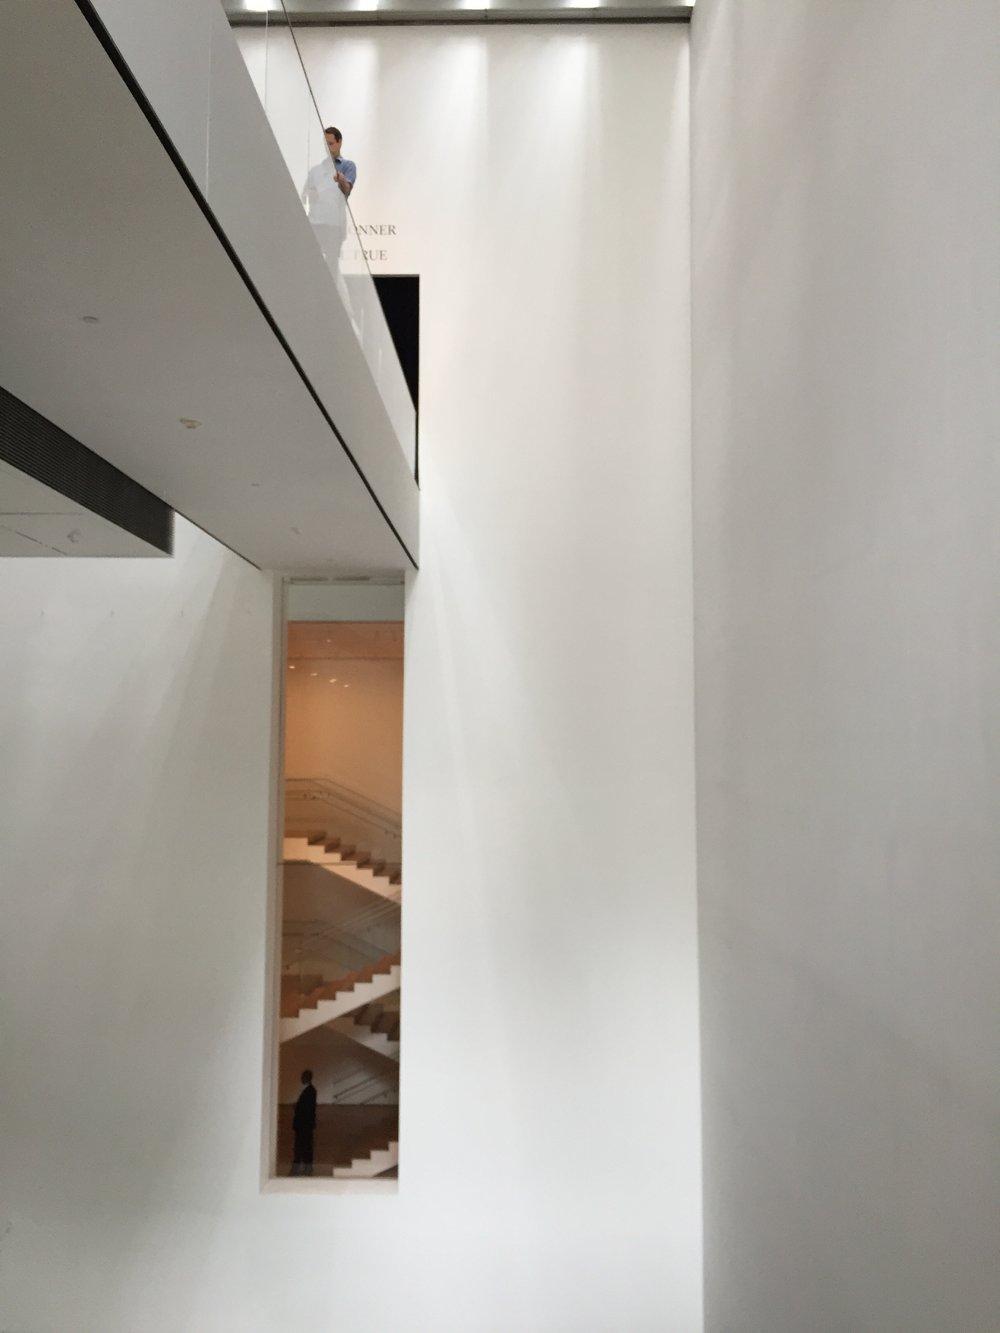 MOMA, New York, New York.